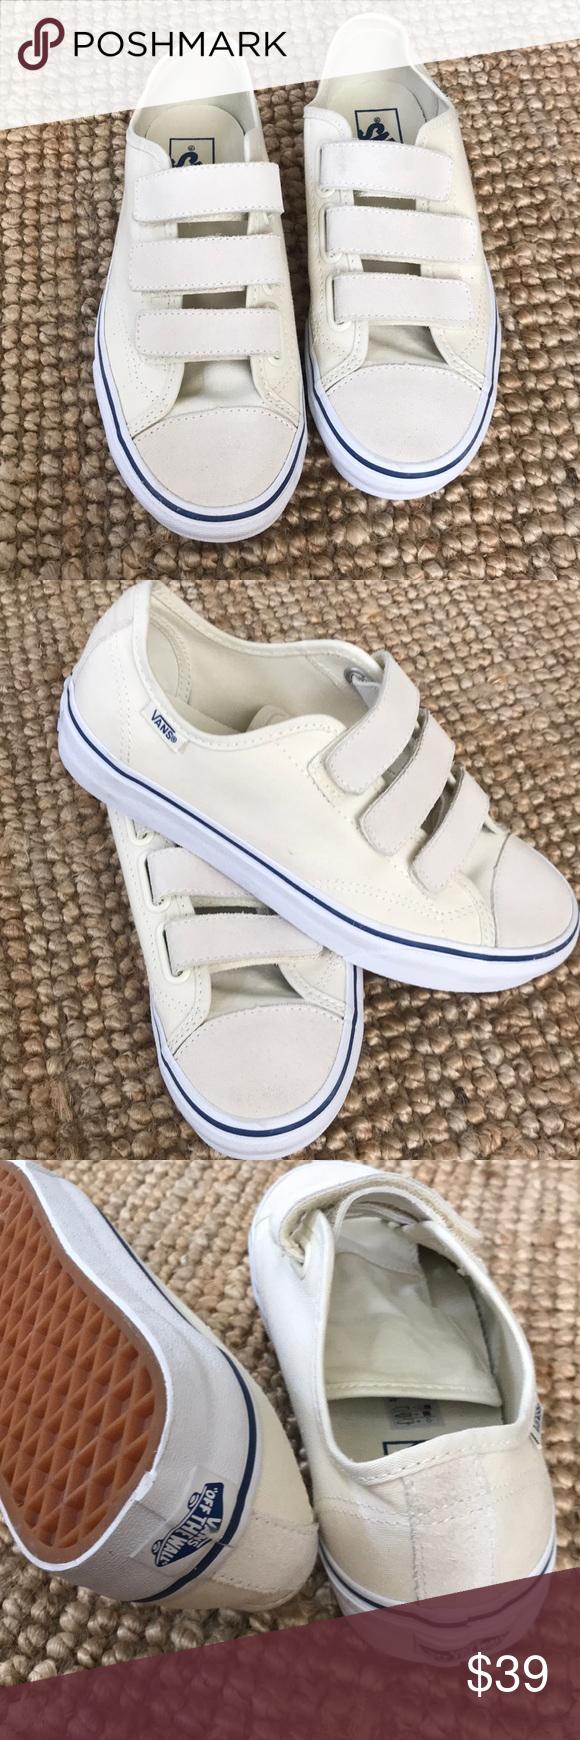 Velcro white canvas sneakers